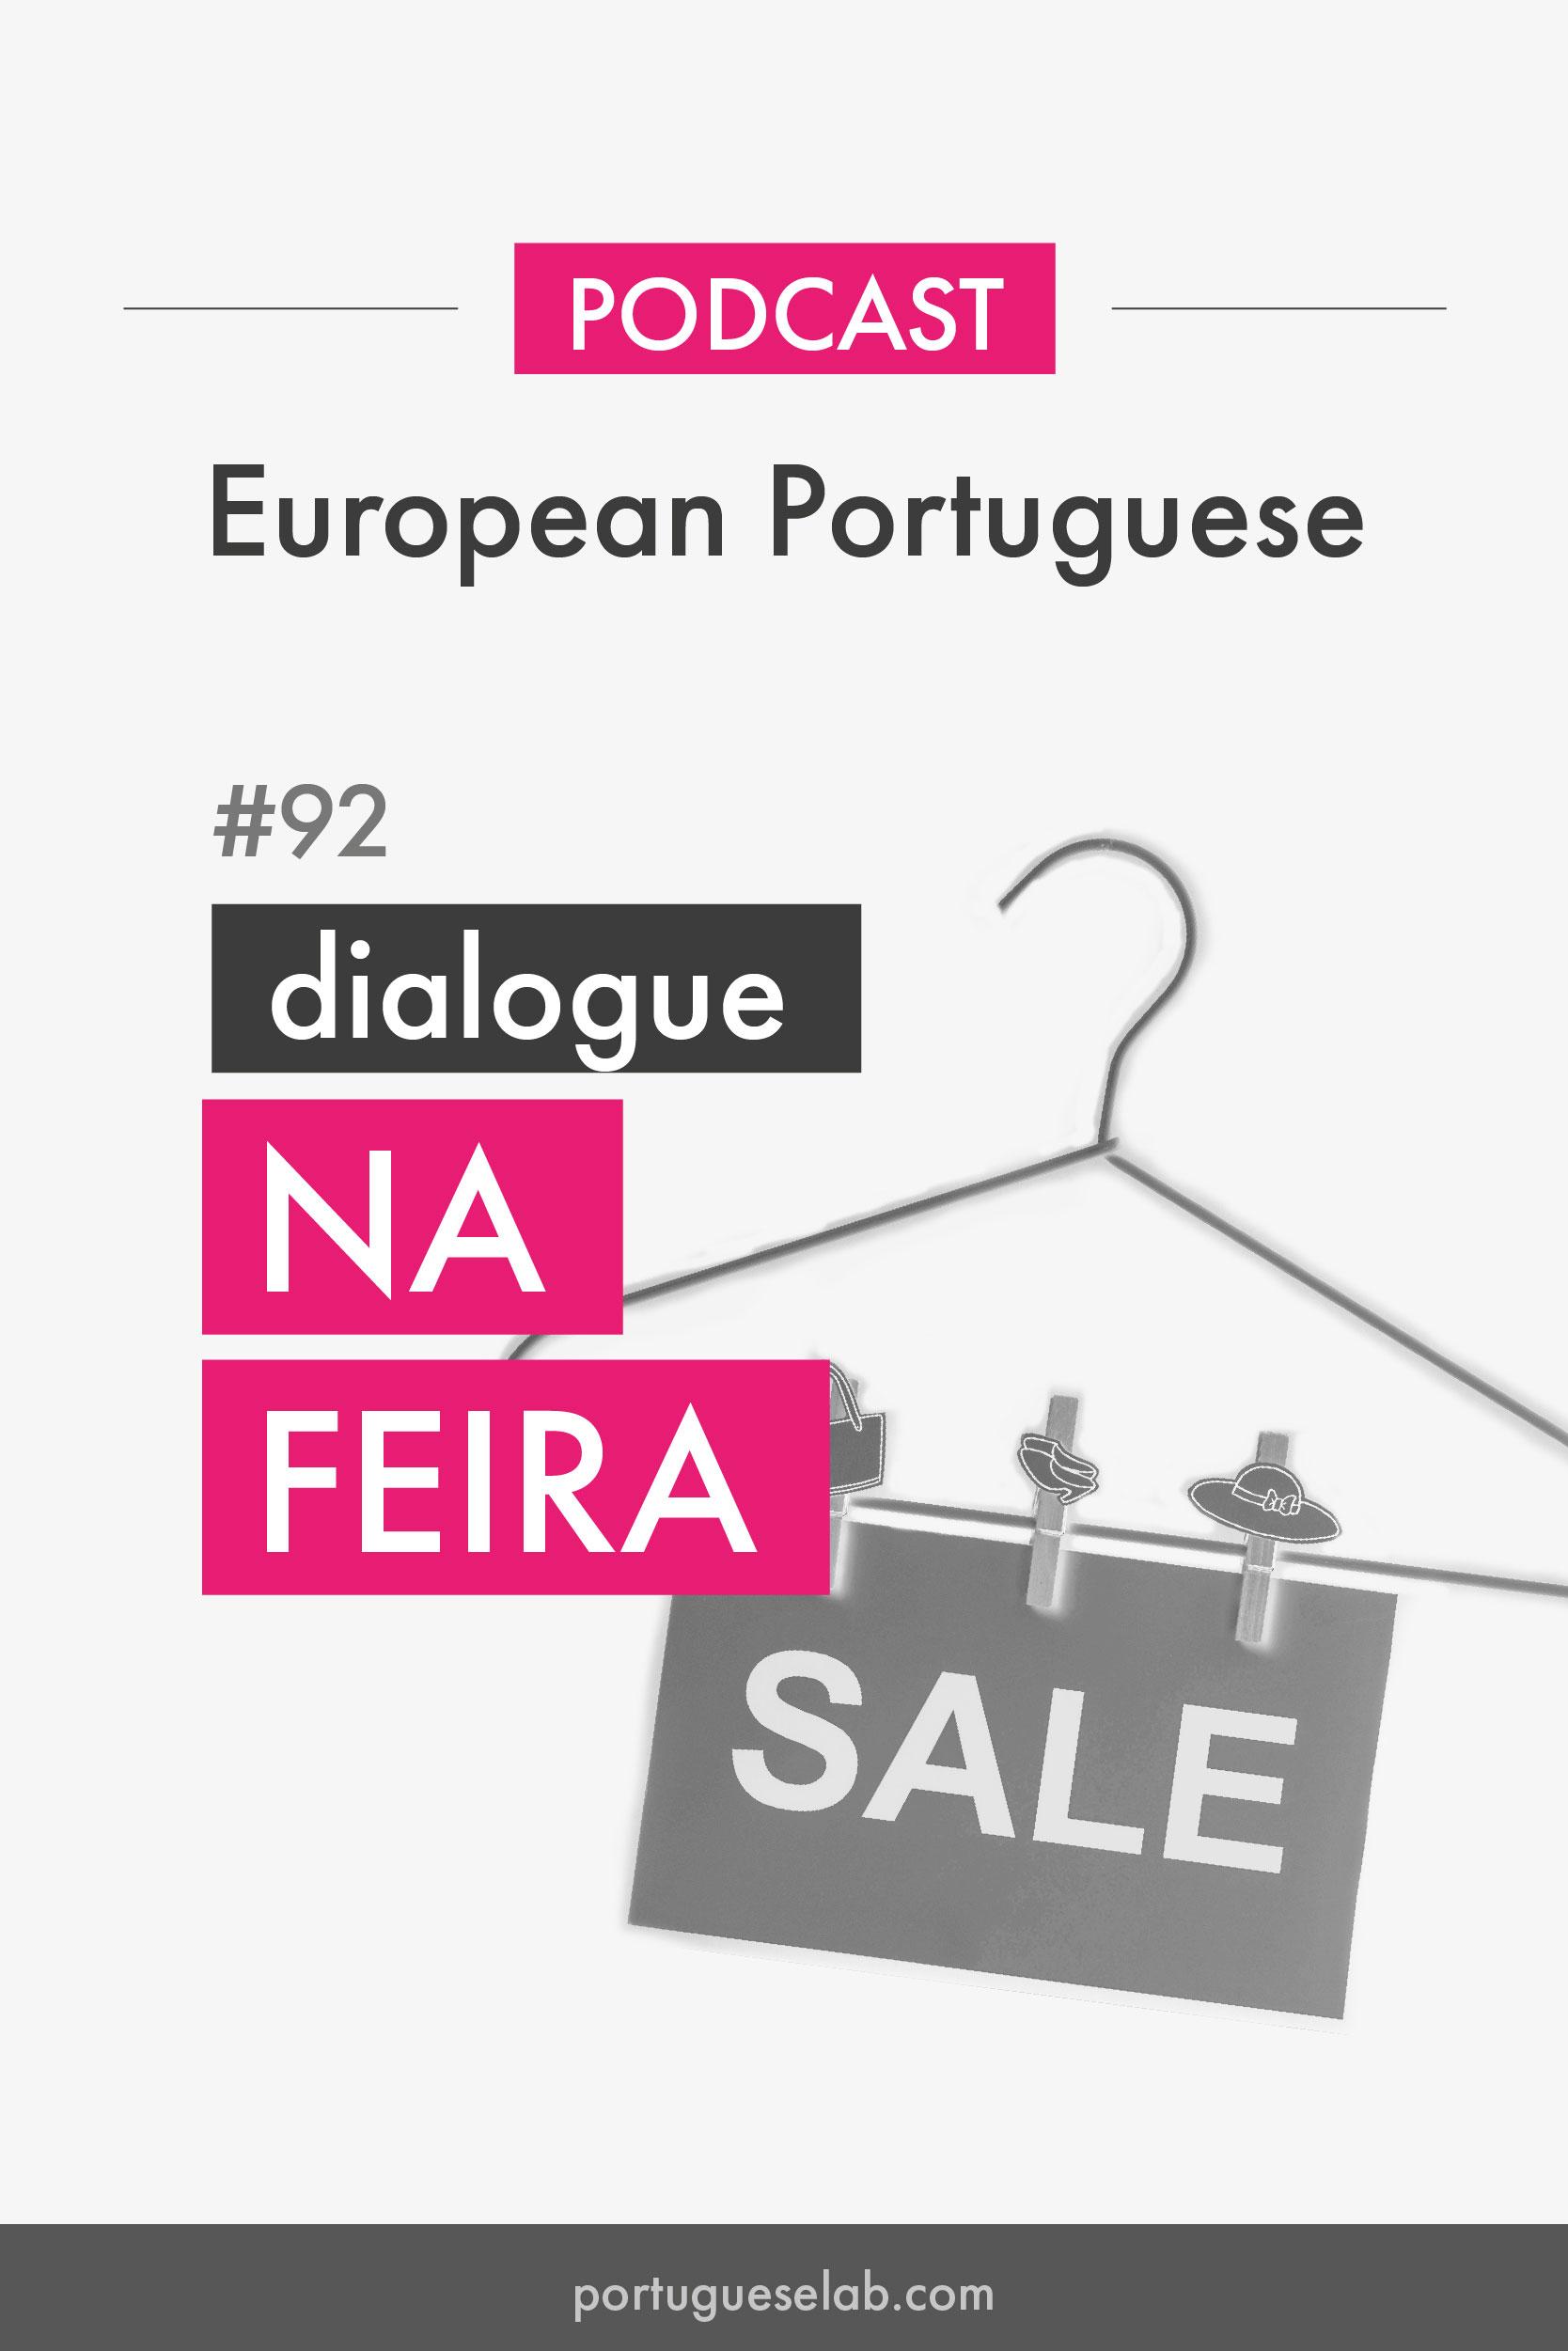 Portuguese-Lab-Podcast-92-Diálogo-na-feira.jpg